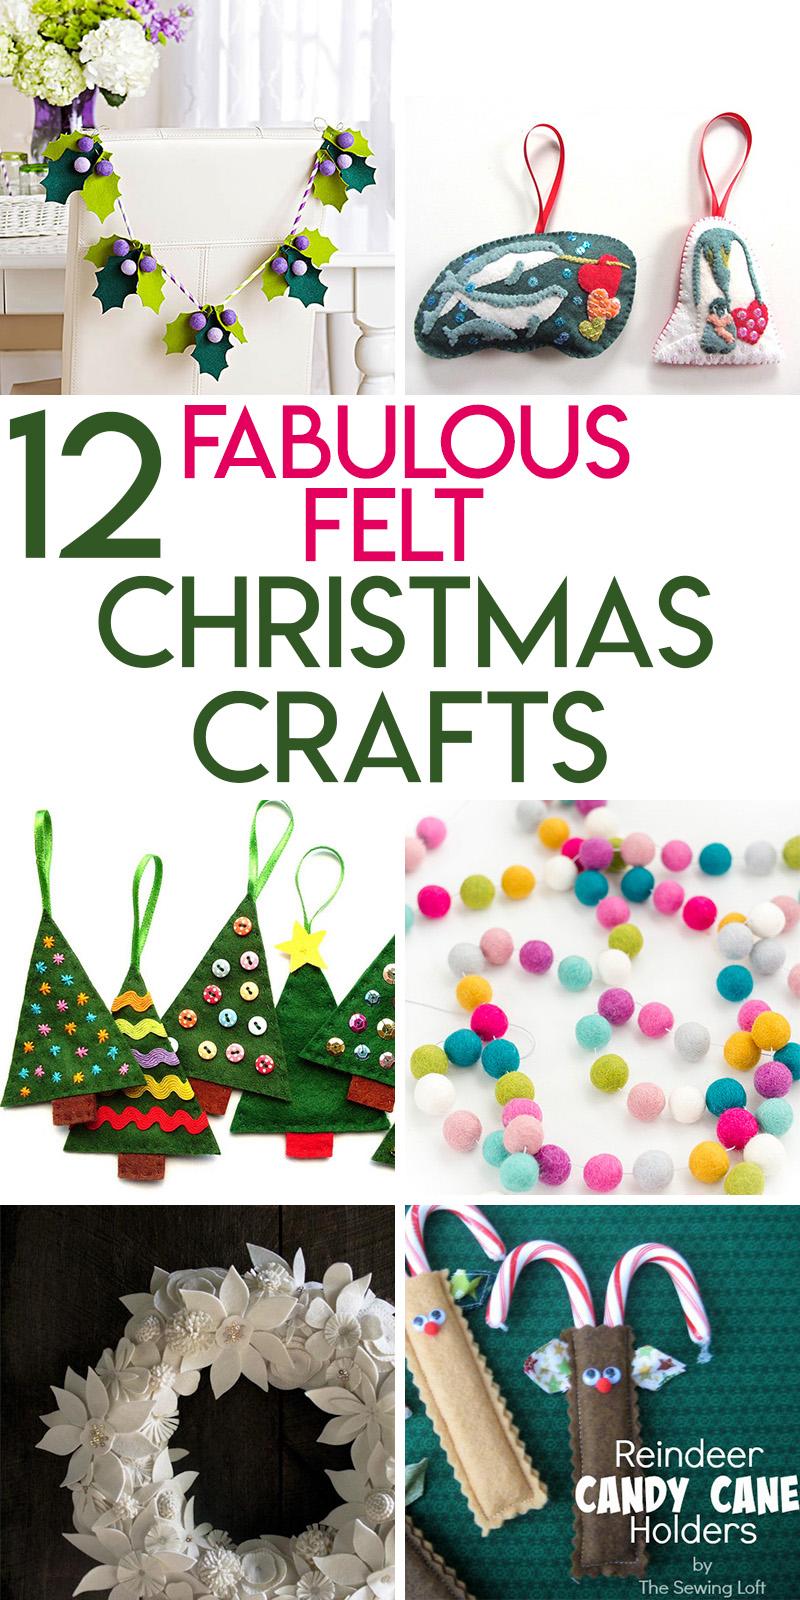 12 fabulous felt Christmas crafts